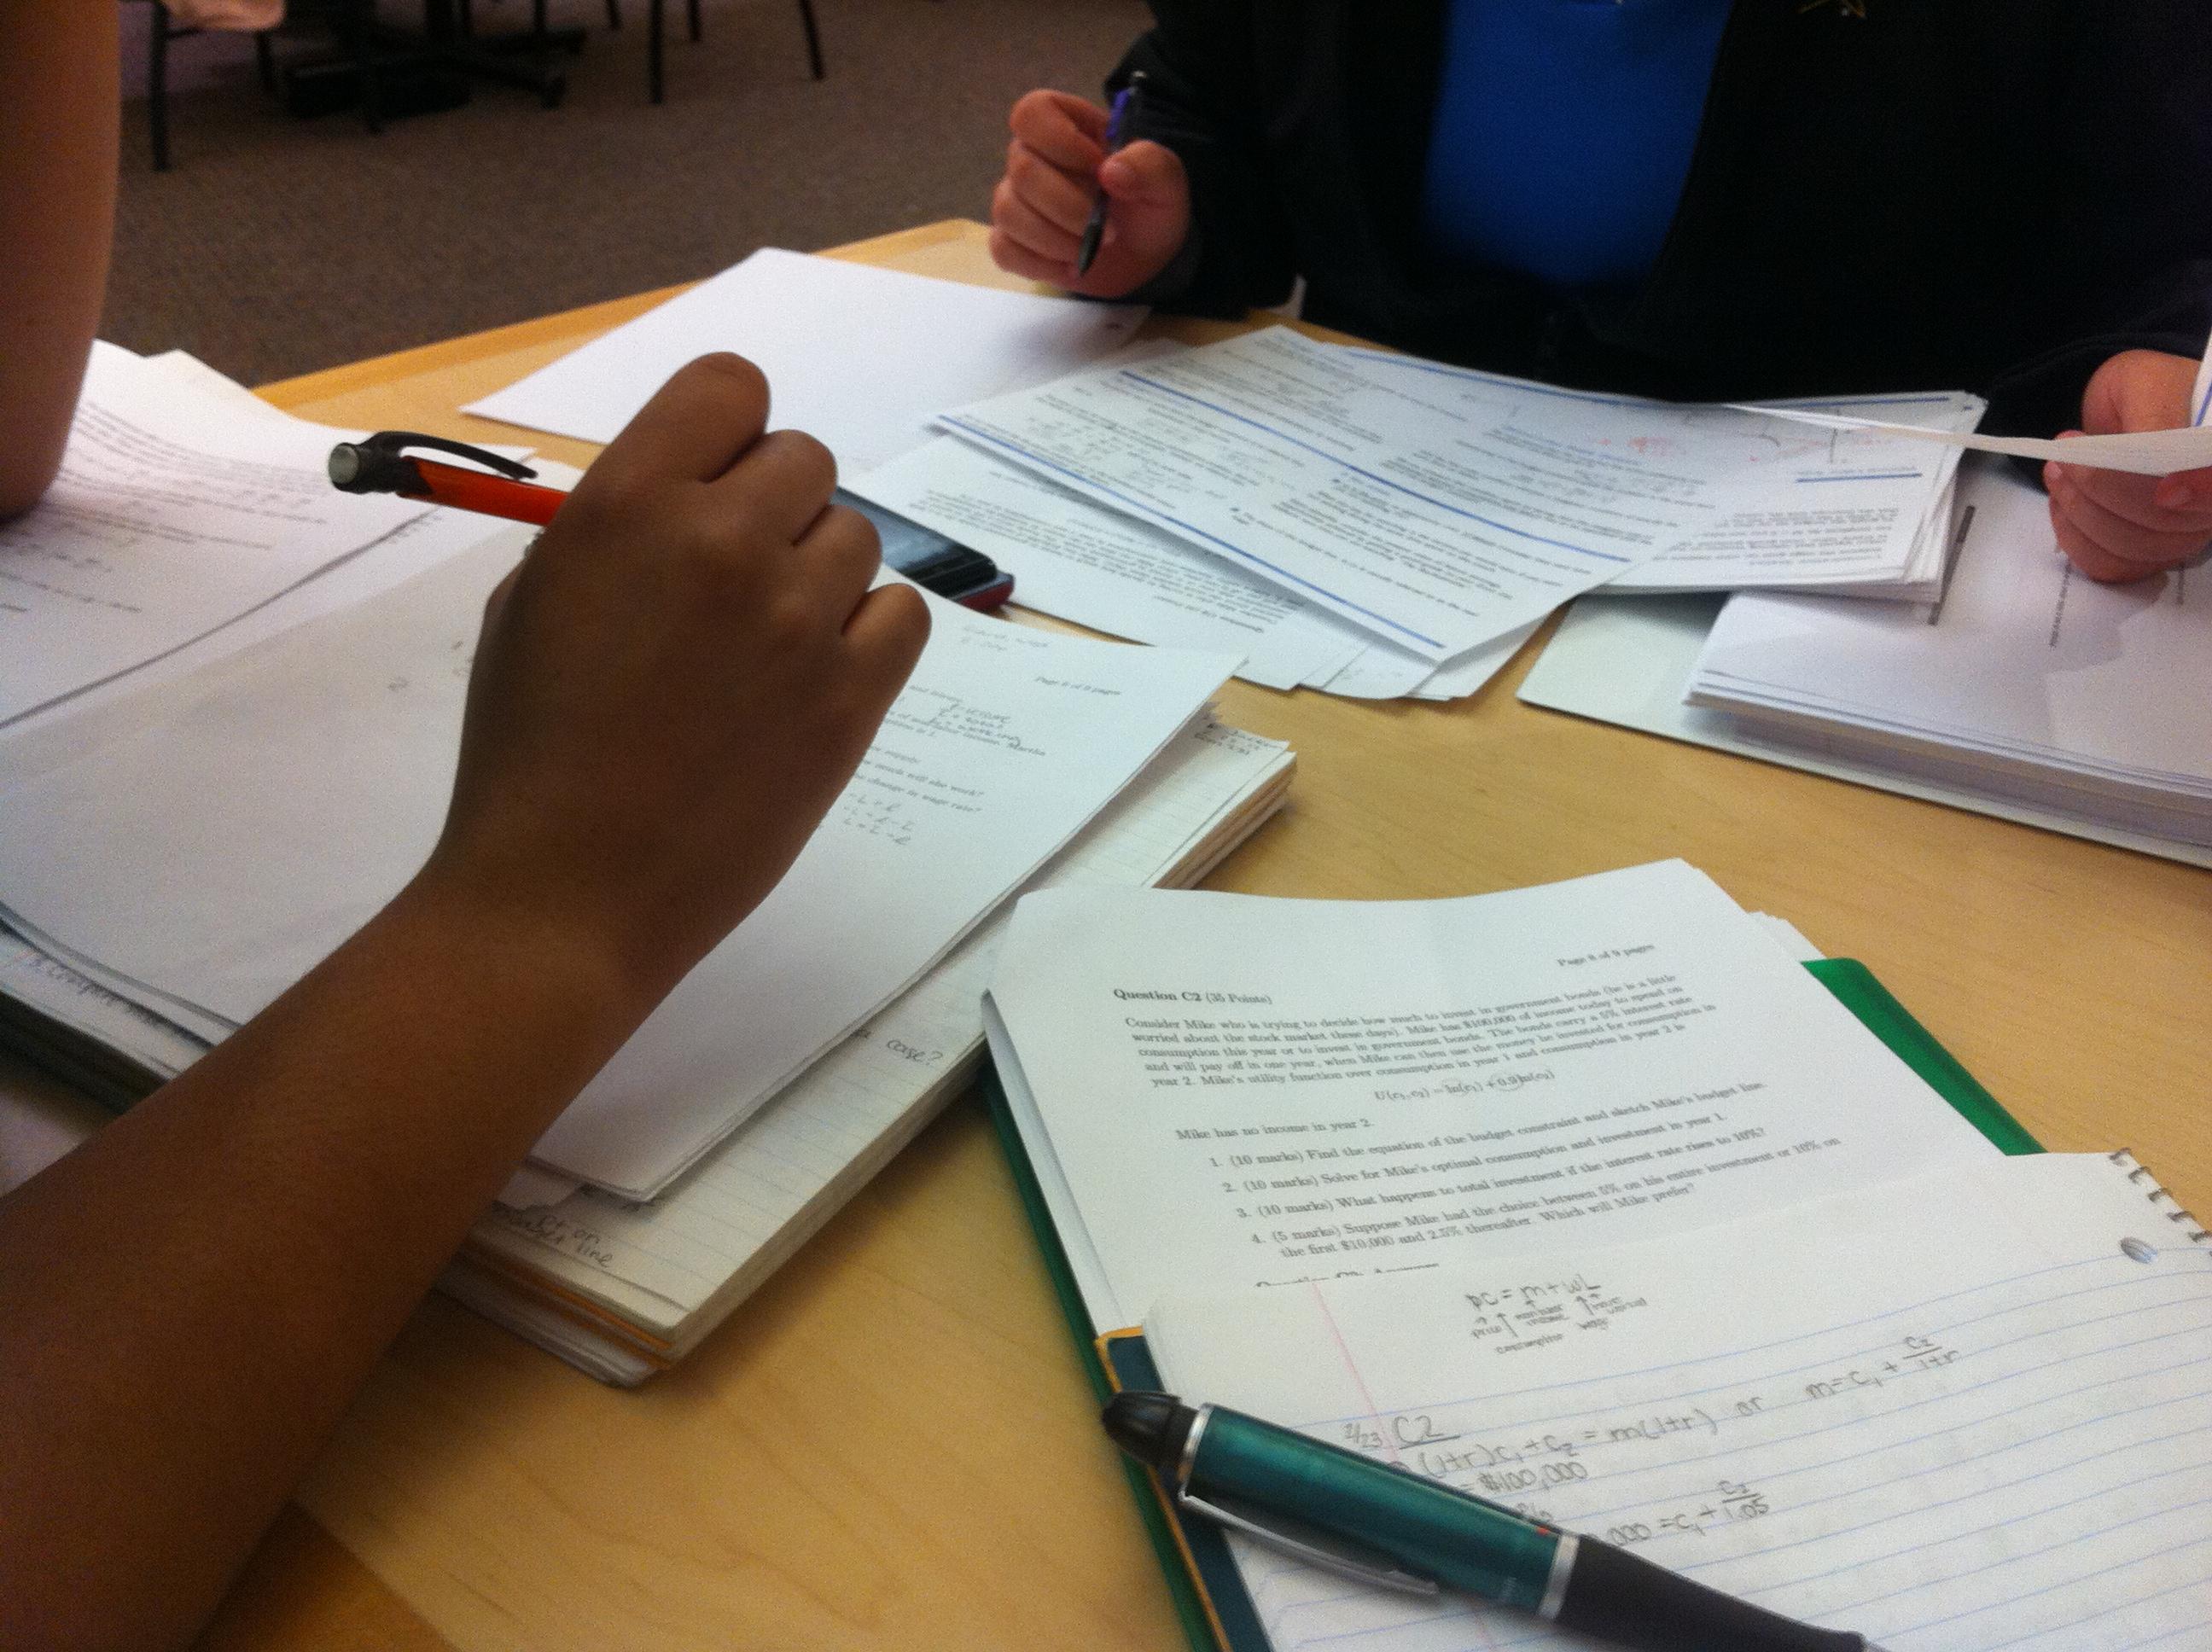 Resume writing service in fairfax va